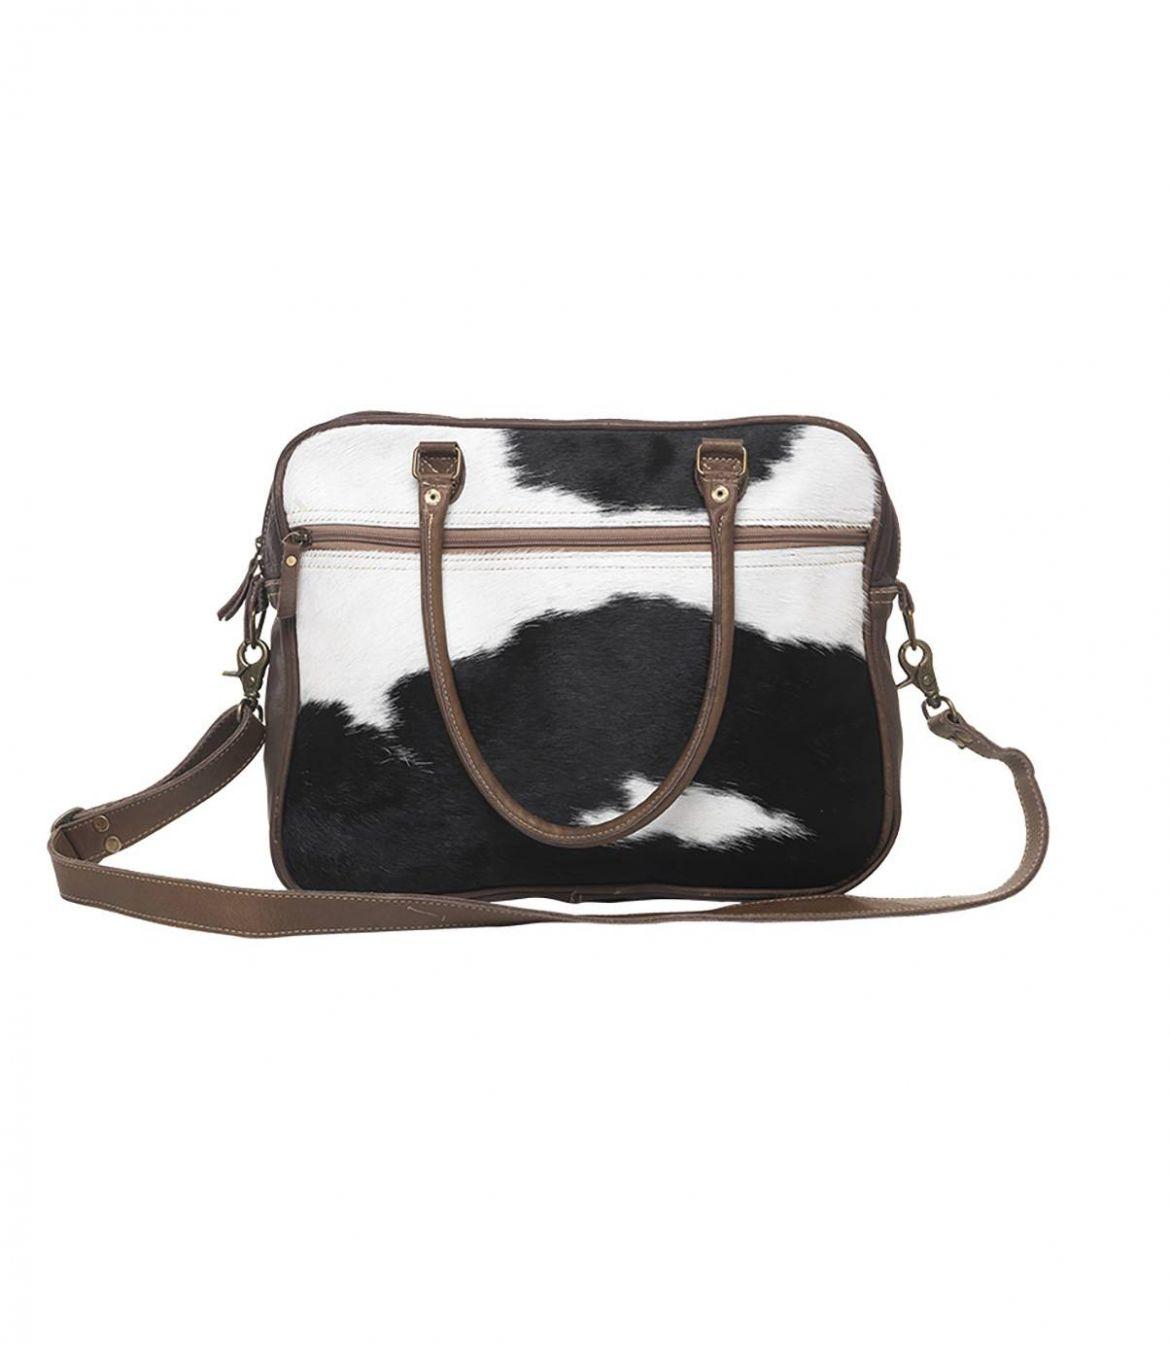 LUDIC CUIR Women's Leather Bag 40x32 cm Storiatipic - 1